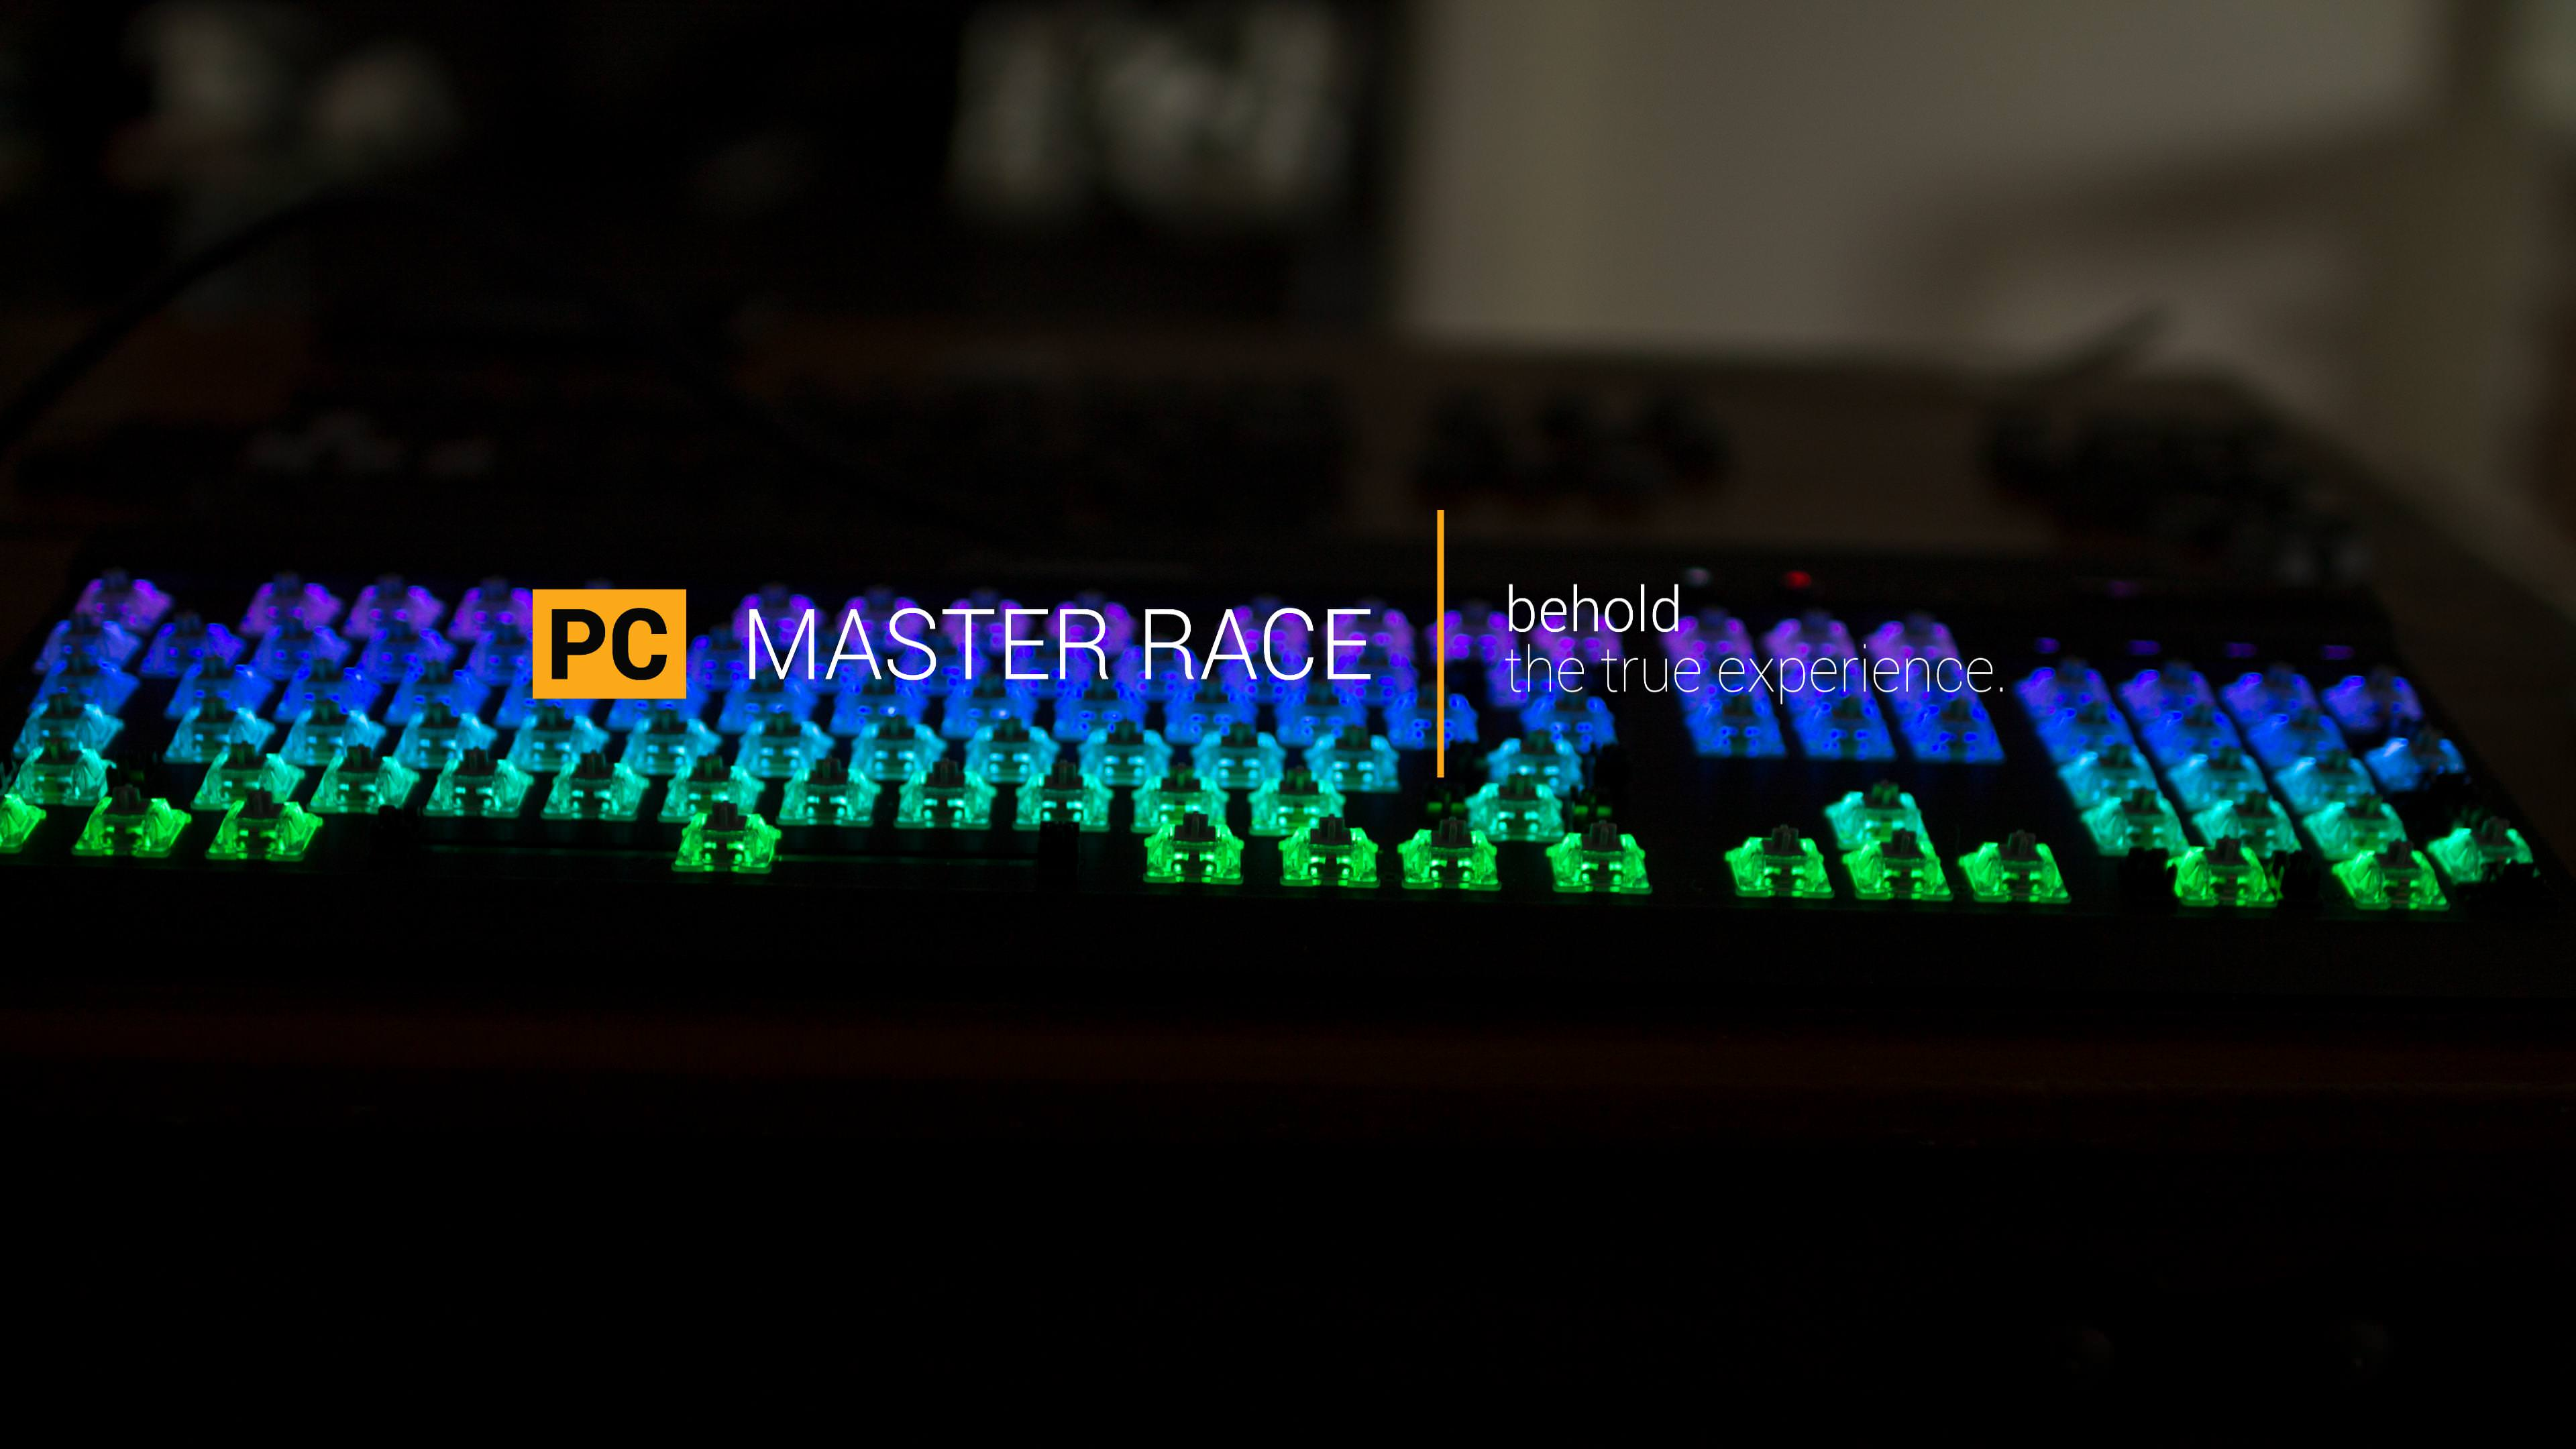 Free Download Pc Master Race 4k Wallpapers Album On Imgur